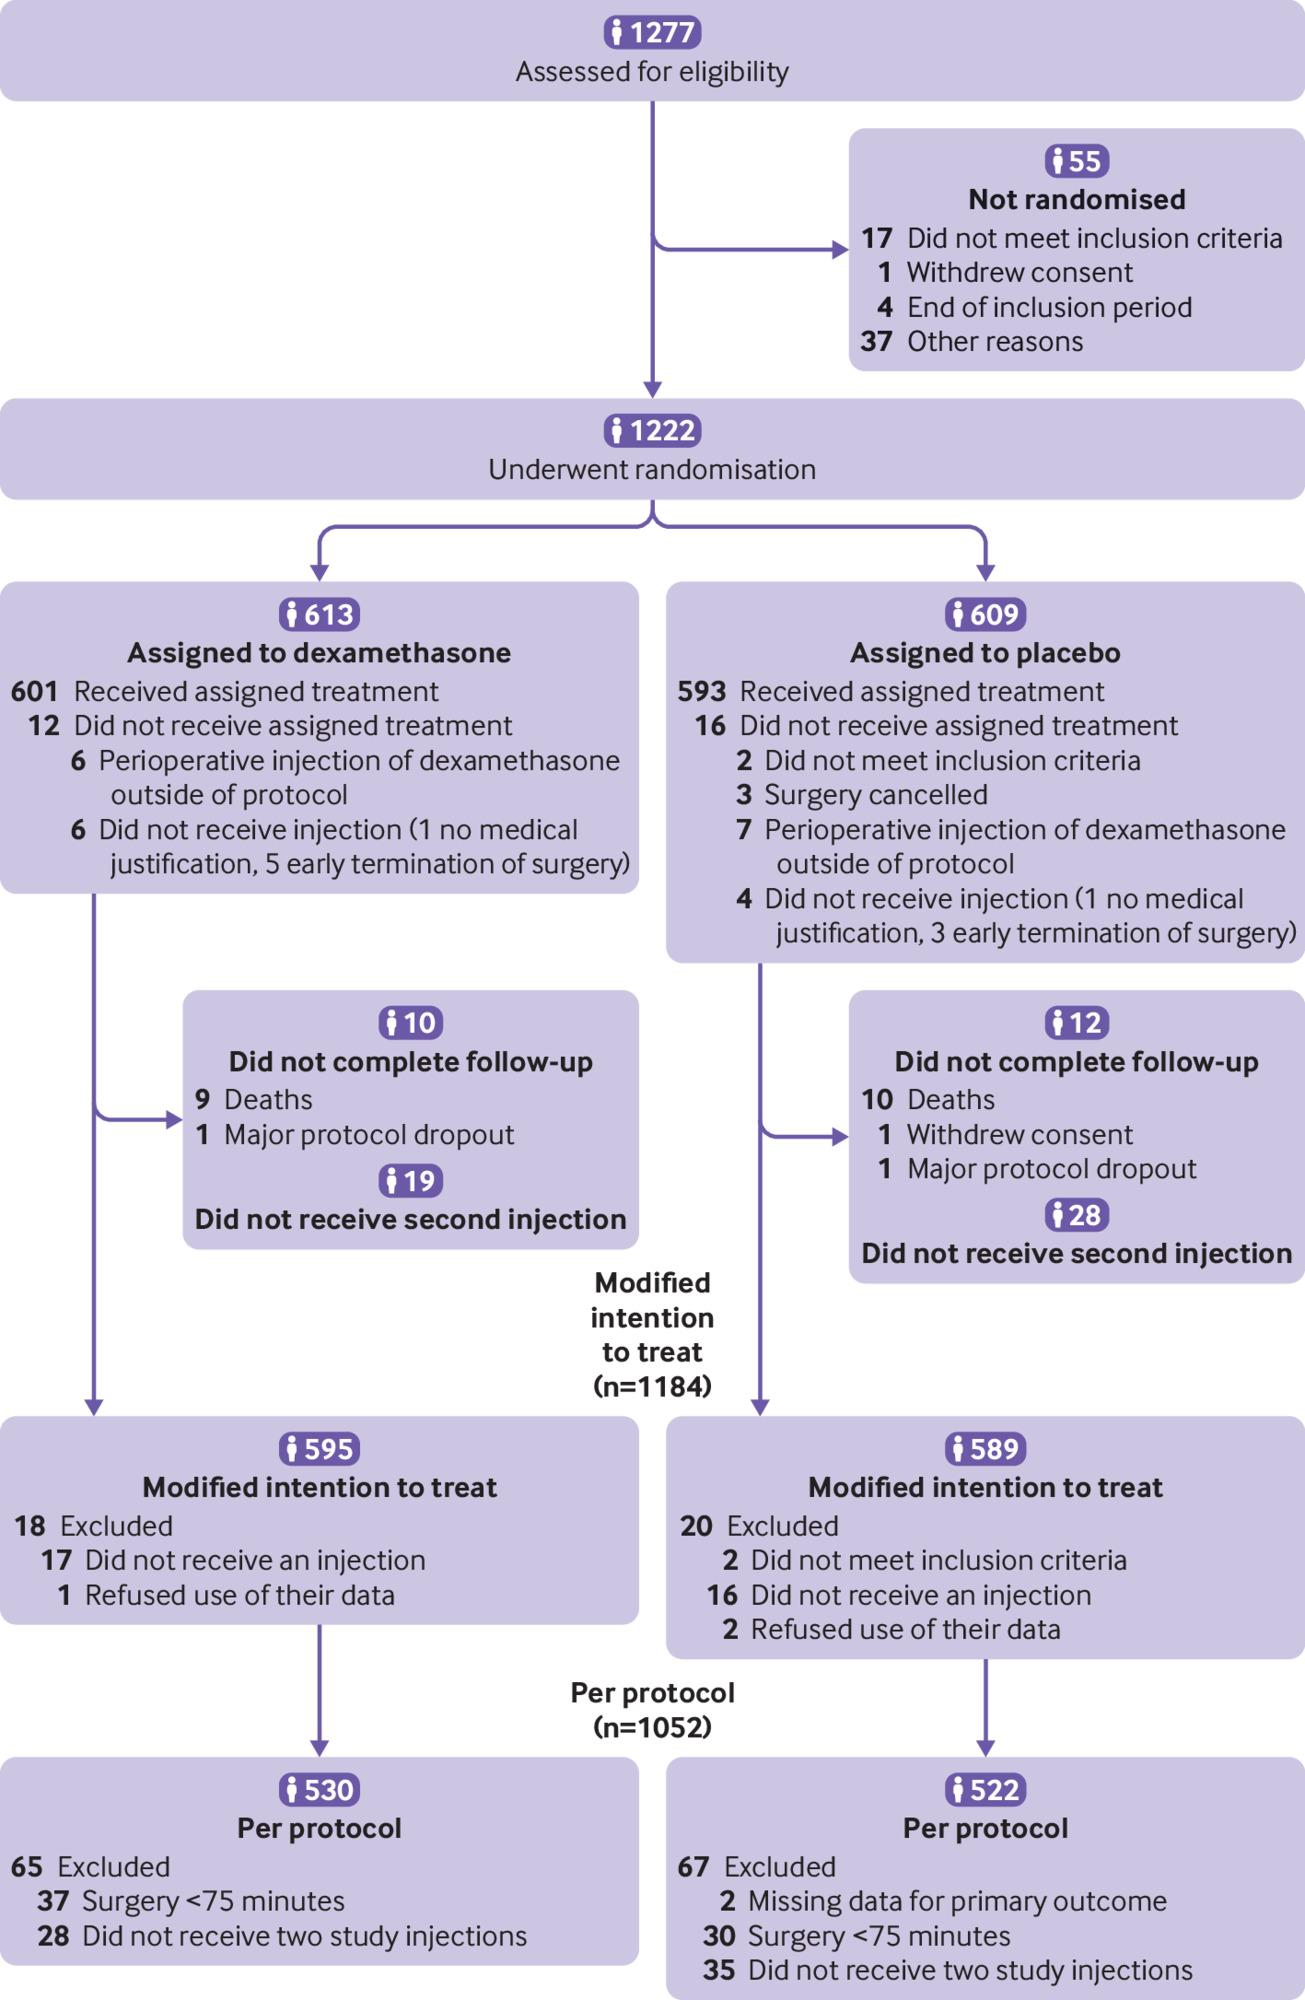 [BMJ发表论文]:地塞米松对非心脏大手术后并发症或全因病死率的影响